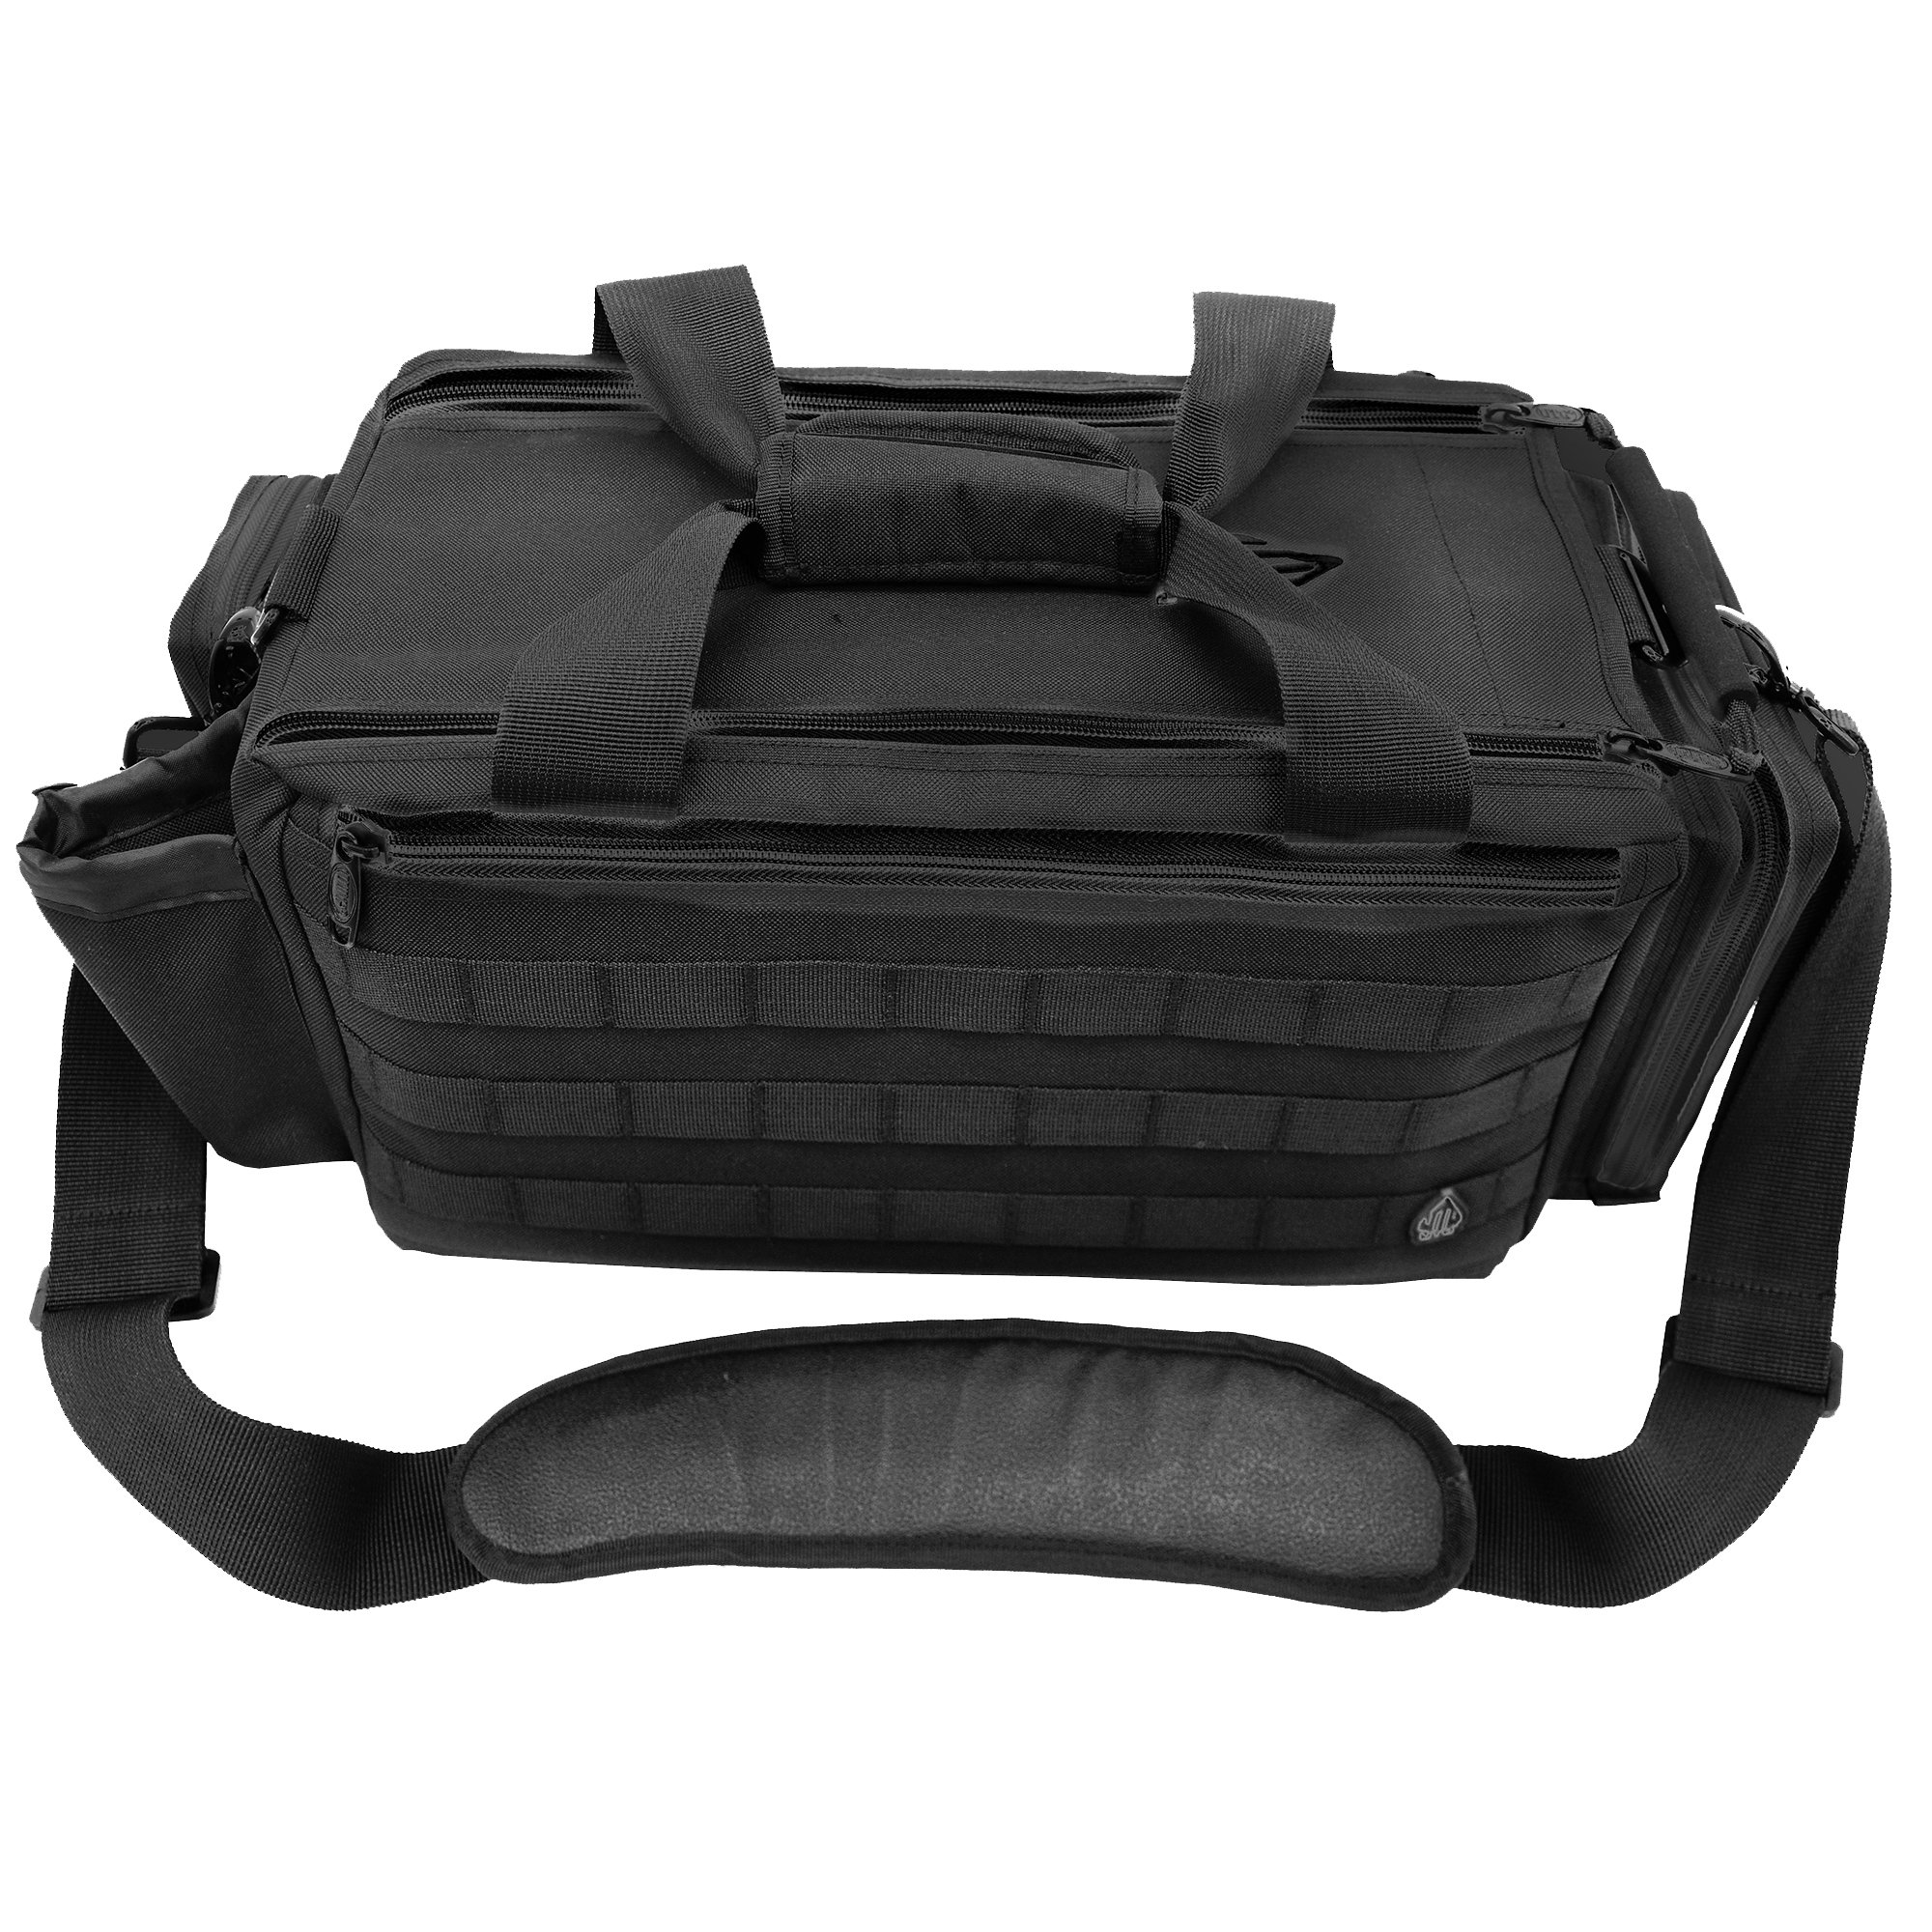 UTG All in One Range/Utility Go Bag, Black, 21'' x 10'' x 9''